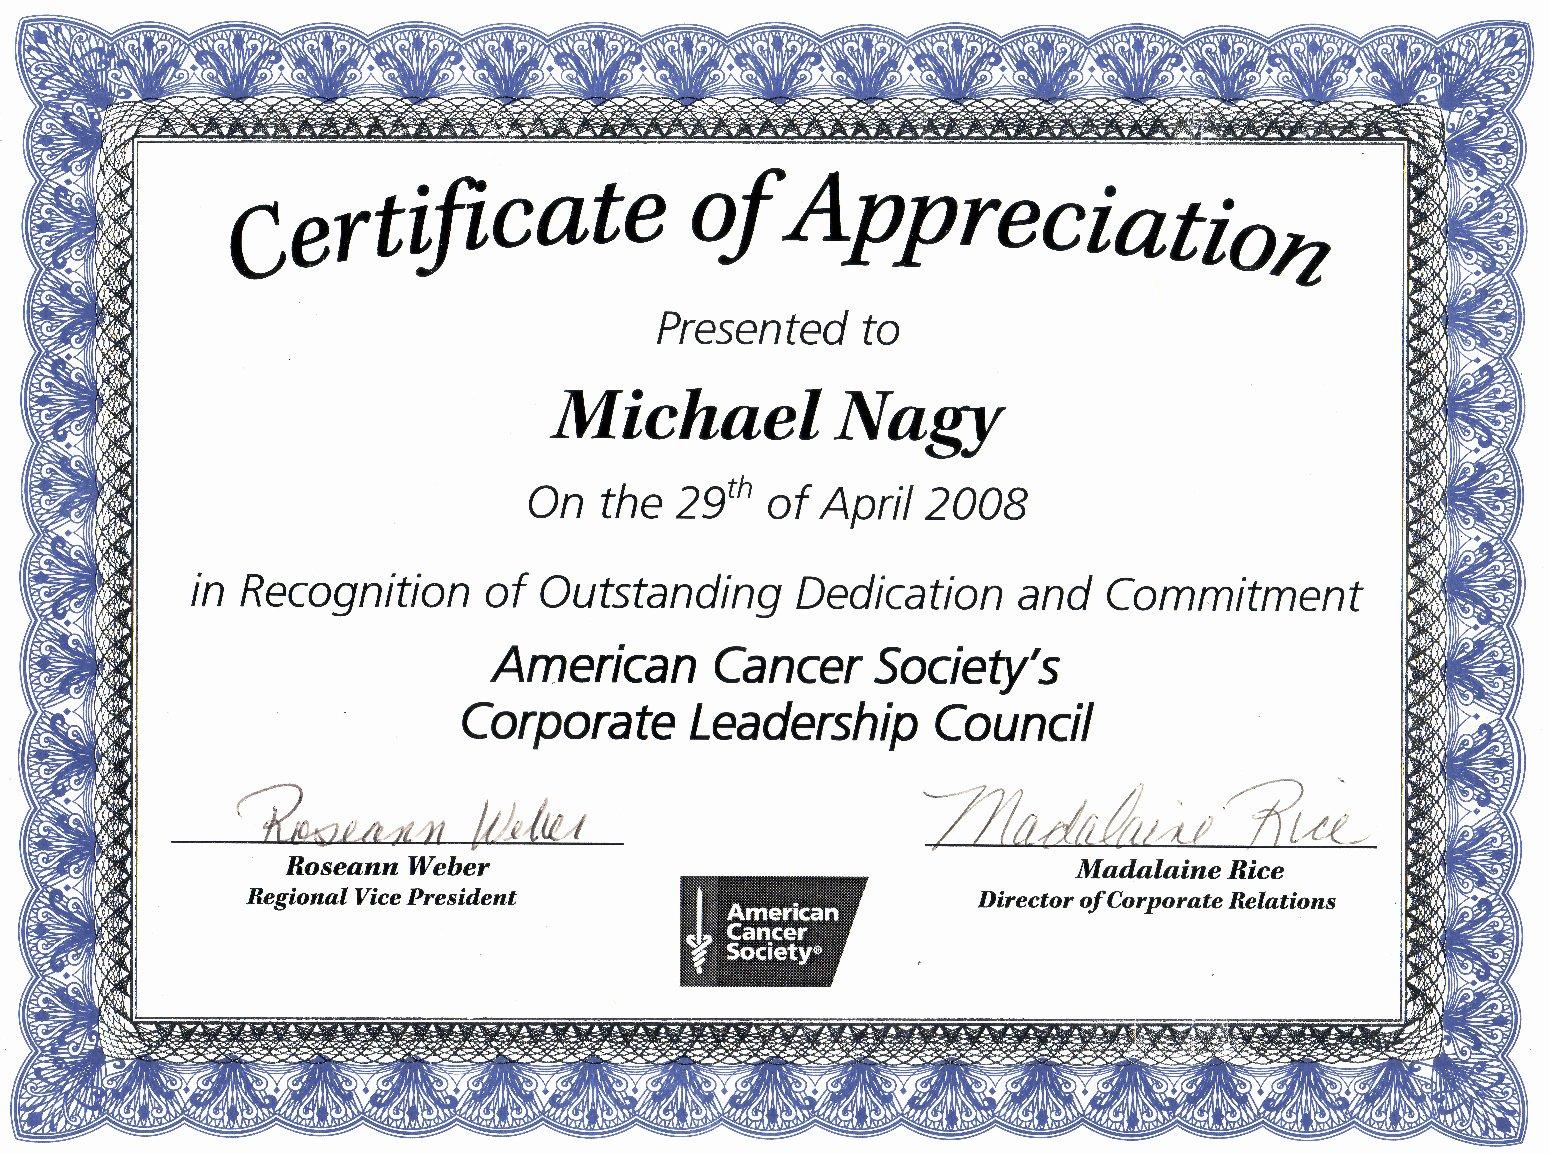 Volunteer Certificate Of Appreciation Templates Best Of Certificate Appreciation Template Best Template